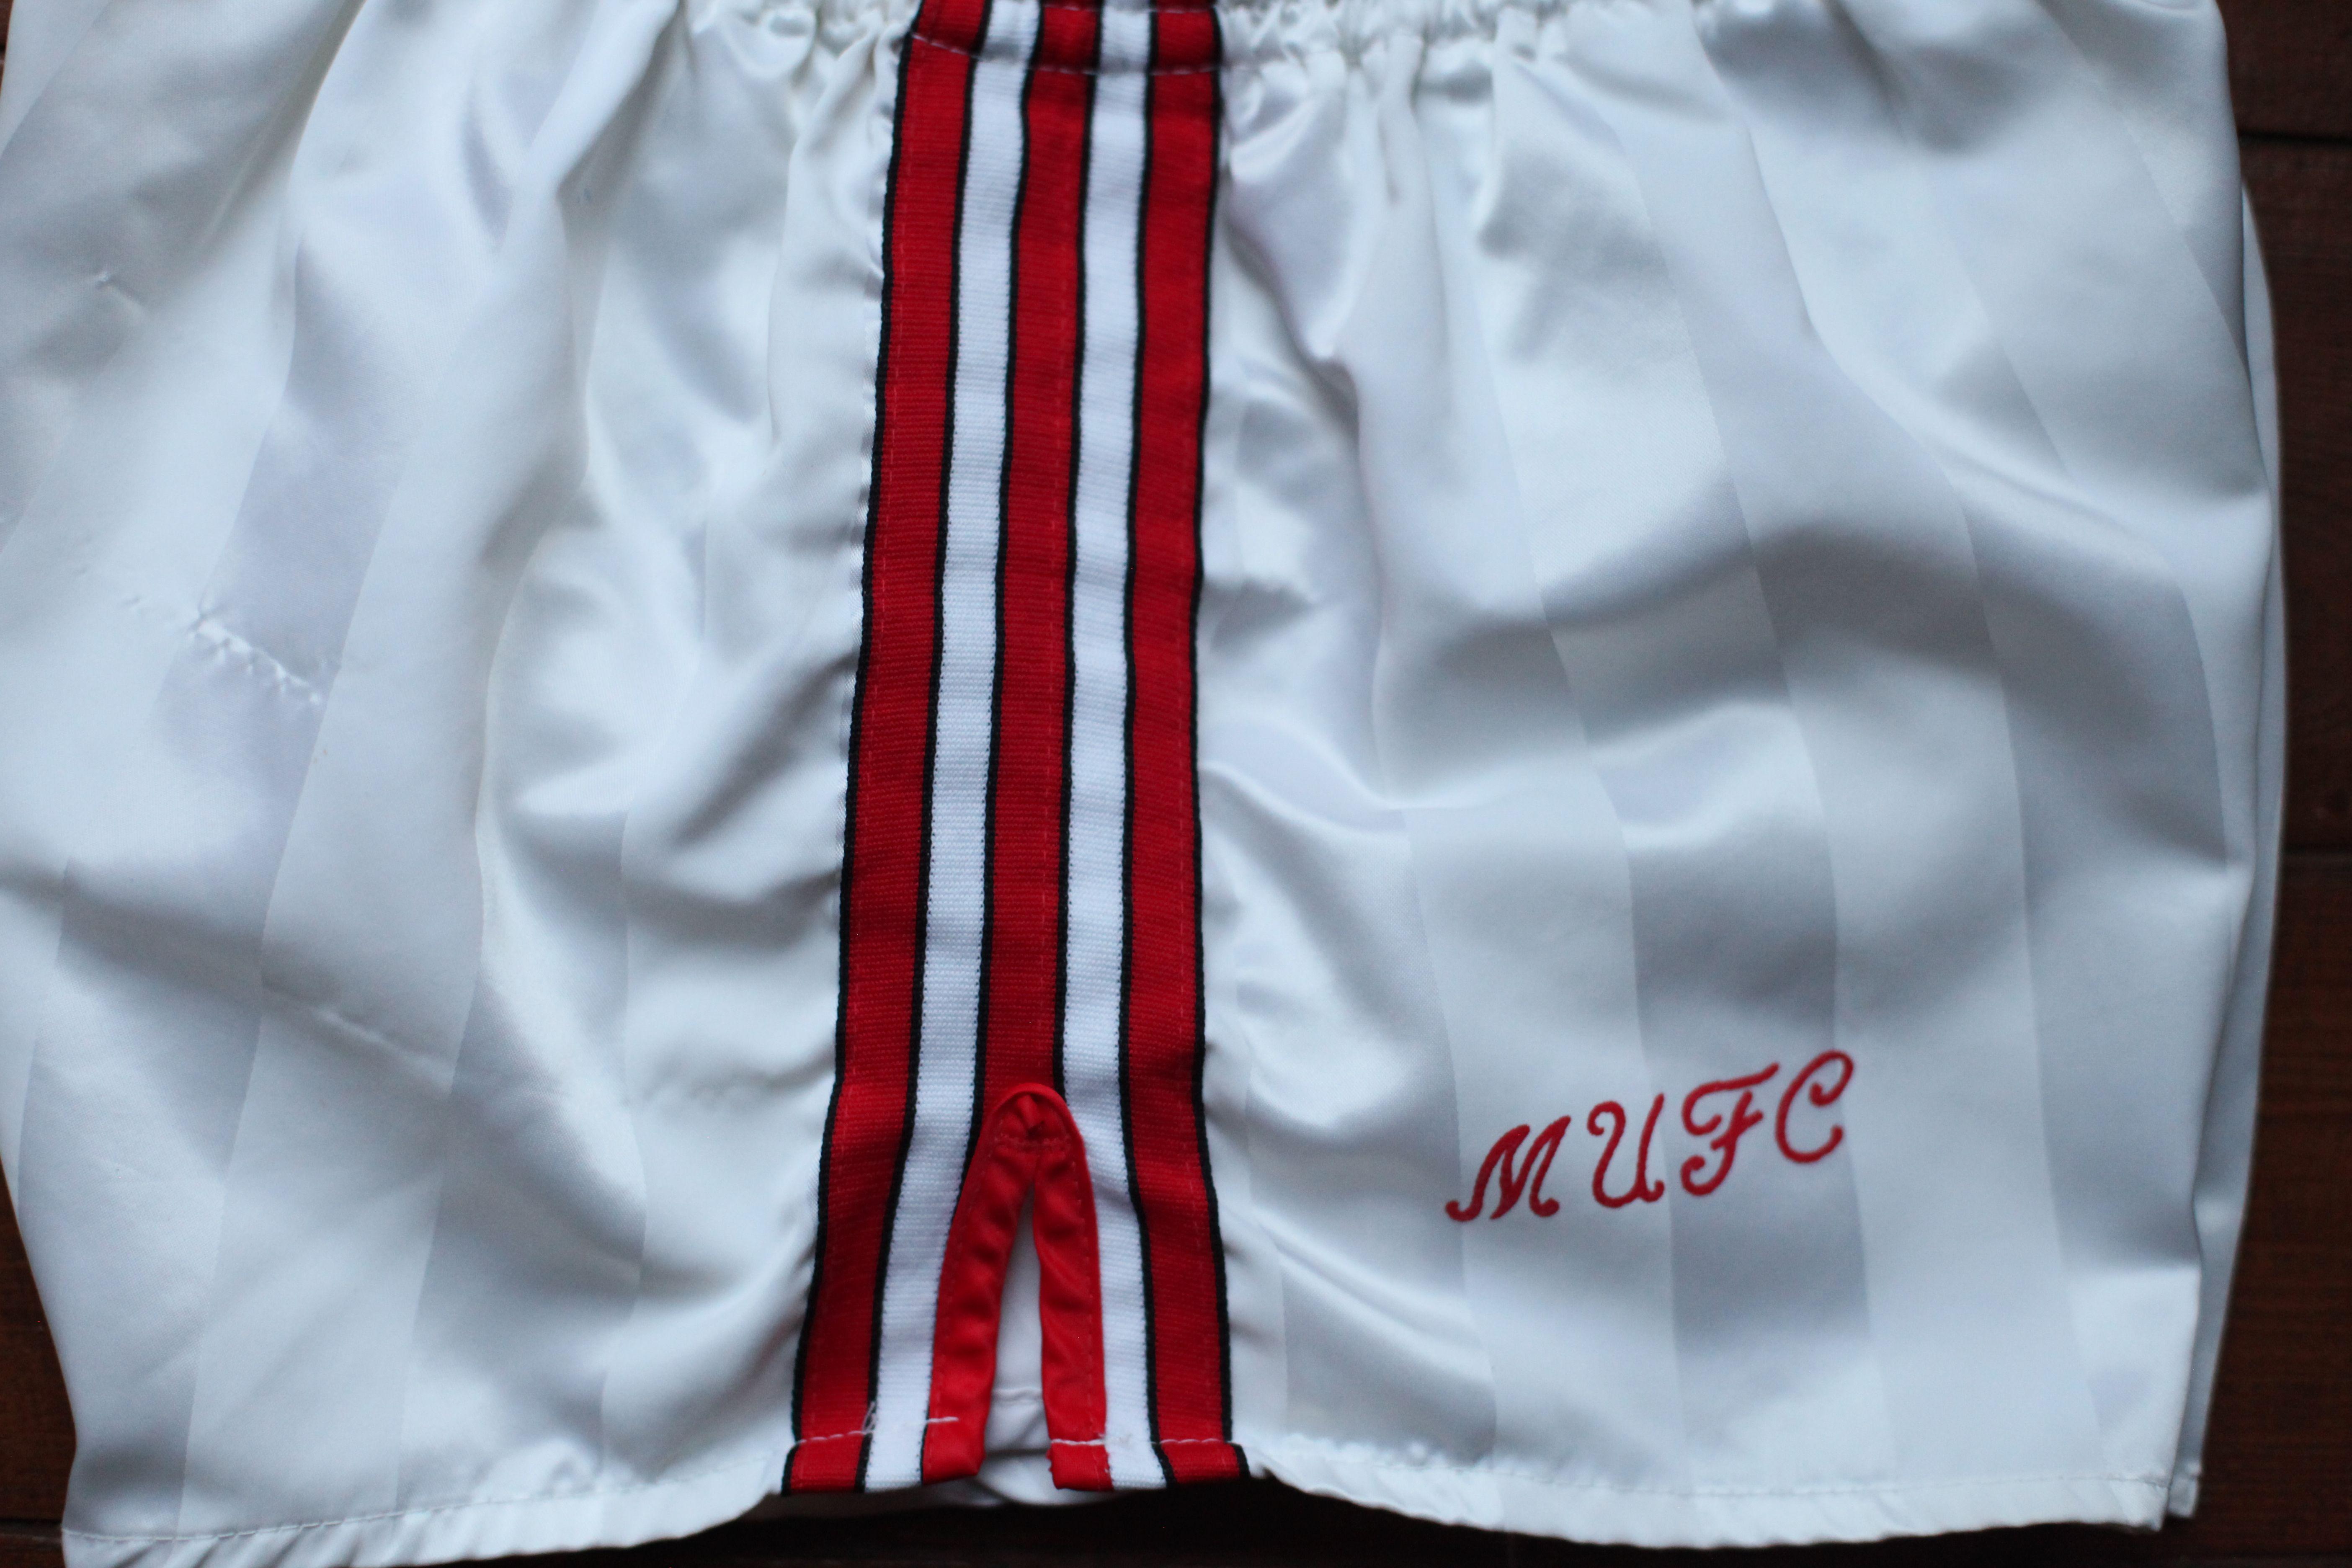 7e3e4aae26625 Rare & Vintage Adidas / Manchester United Away Shorts. White / Red ...